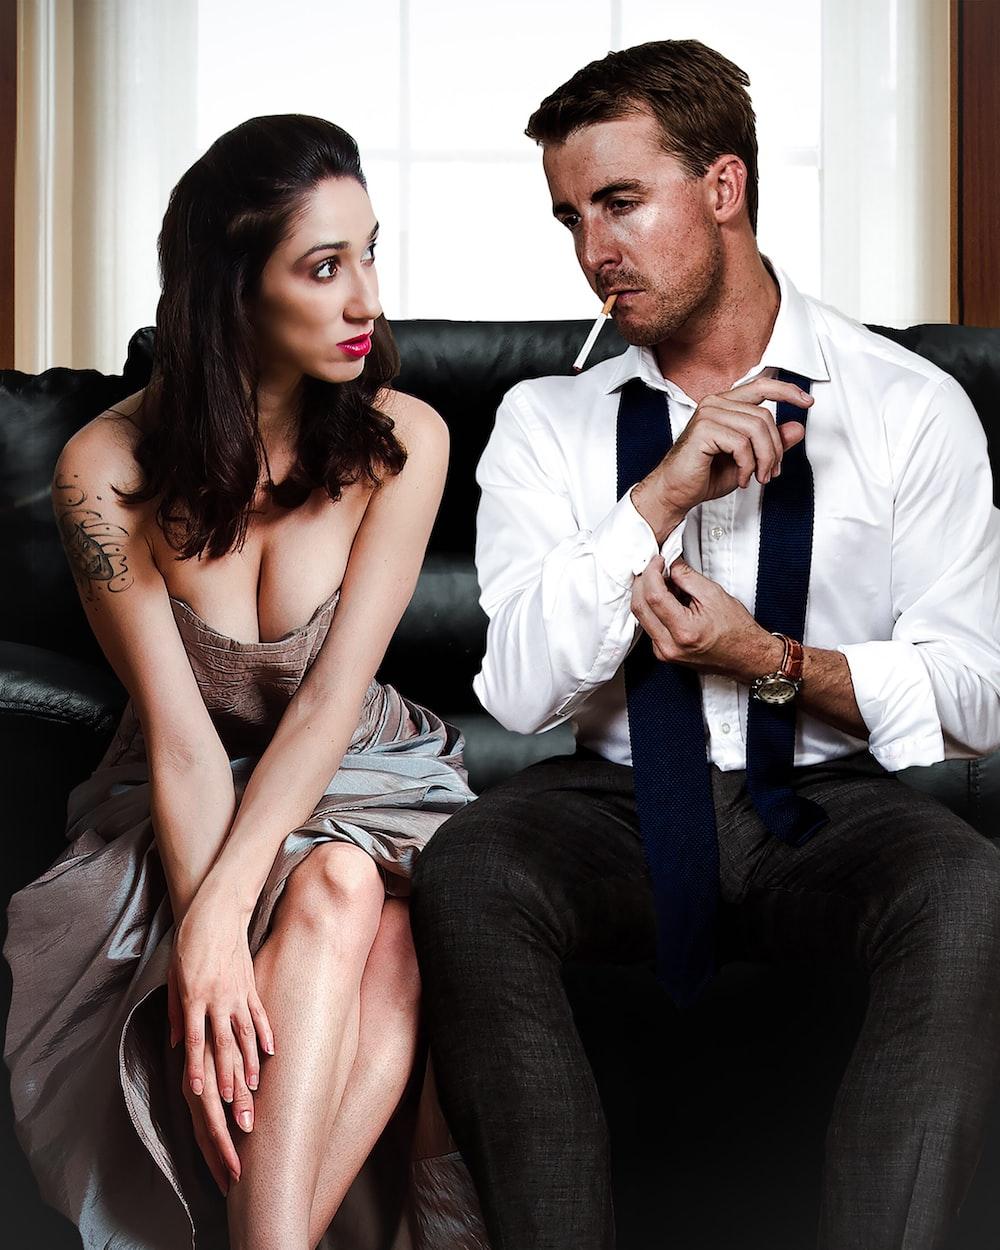 man sitting on sofa beside woman